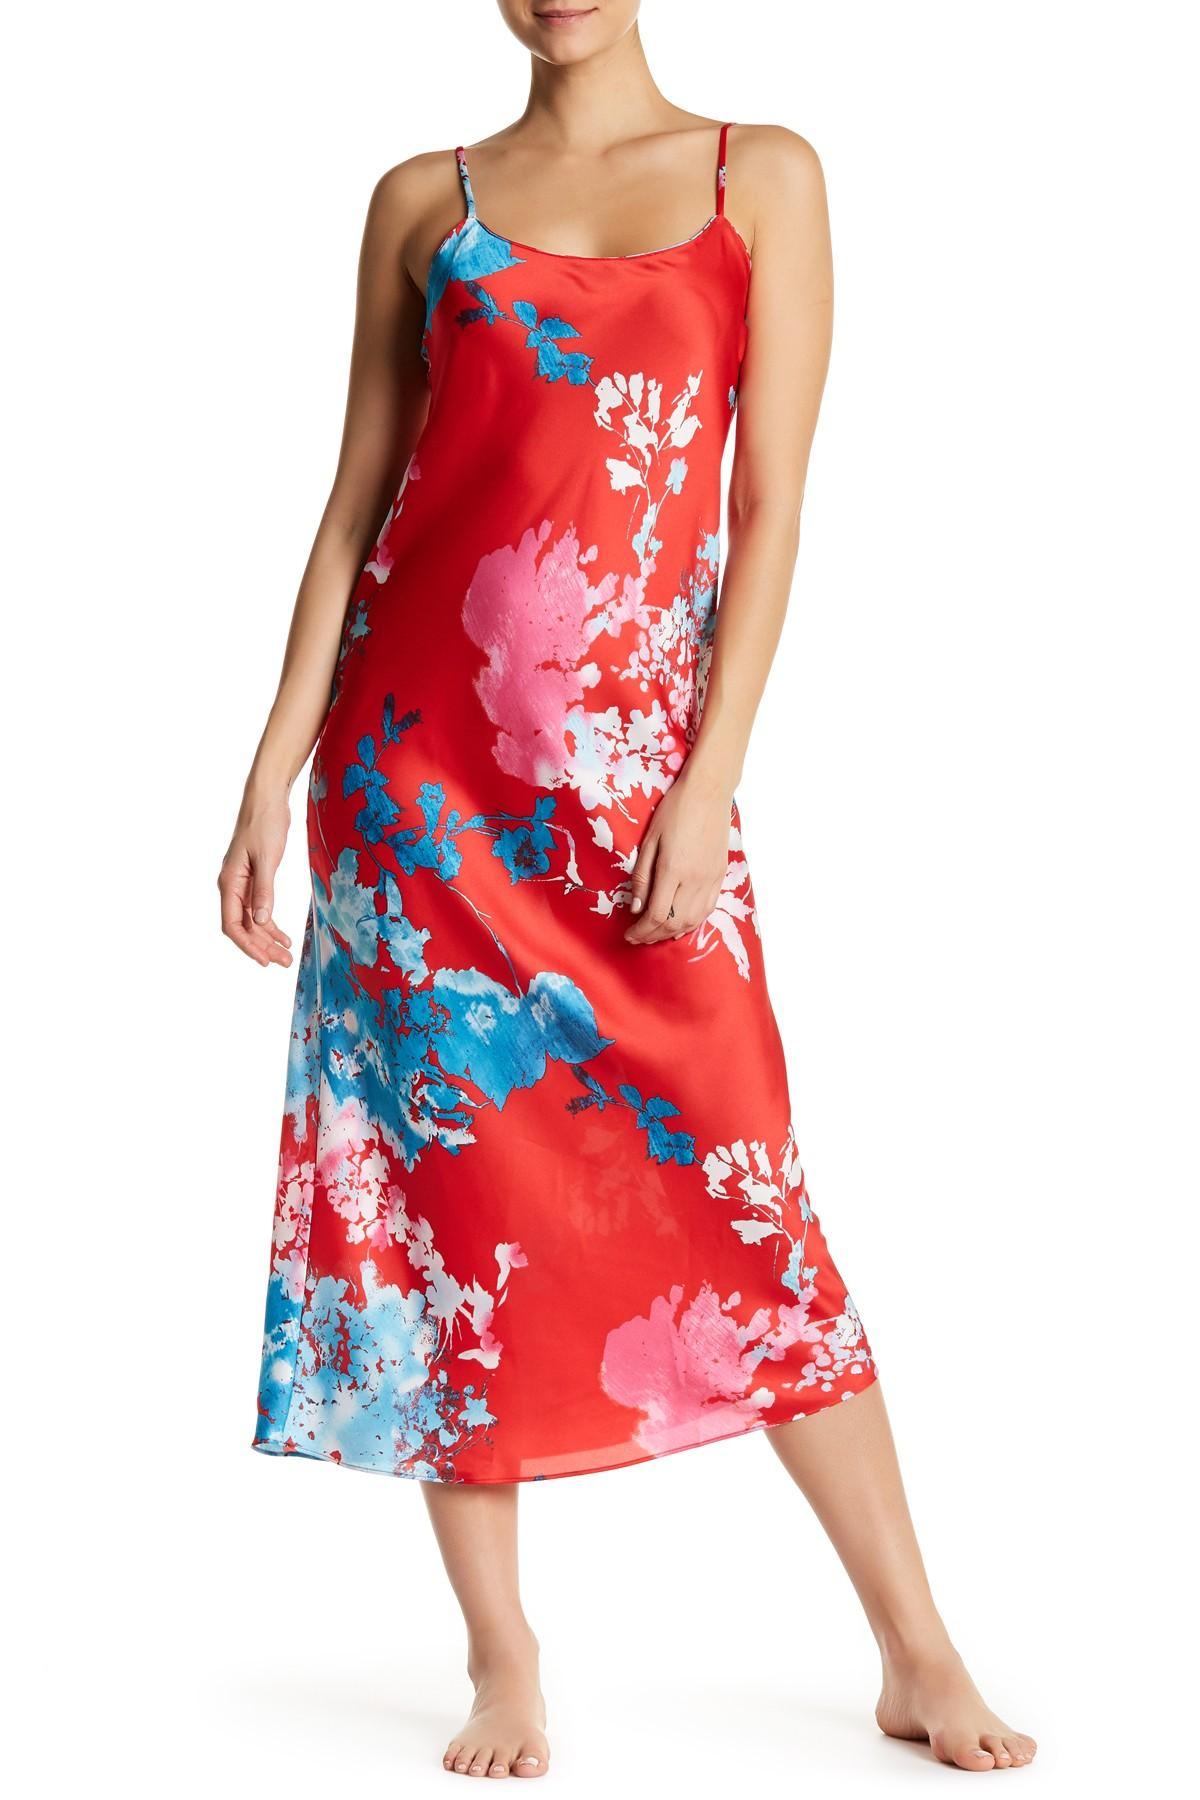 Lyst Natori Chianti Floral Satin Nightgown in Red